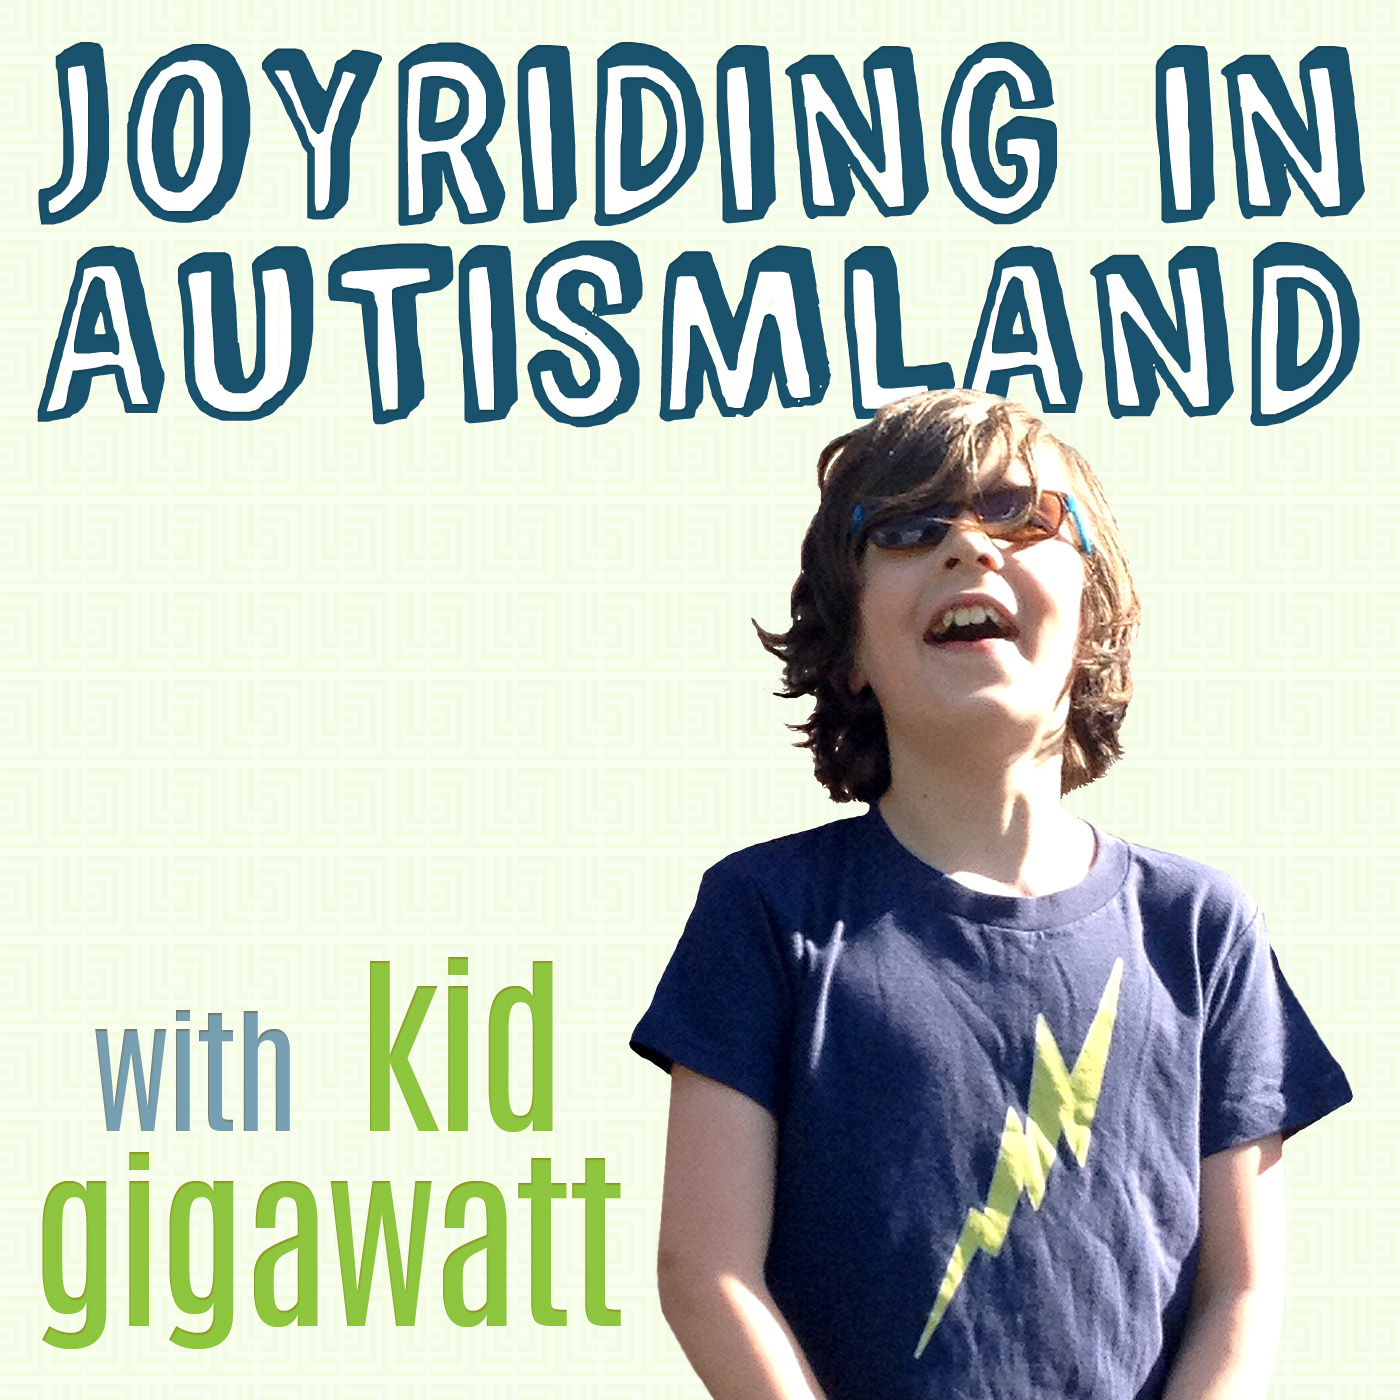 Joyriding In Autismland: Autism Podcast with Kid Gigawatt